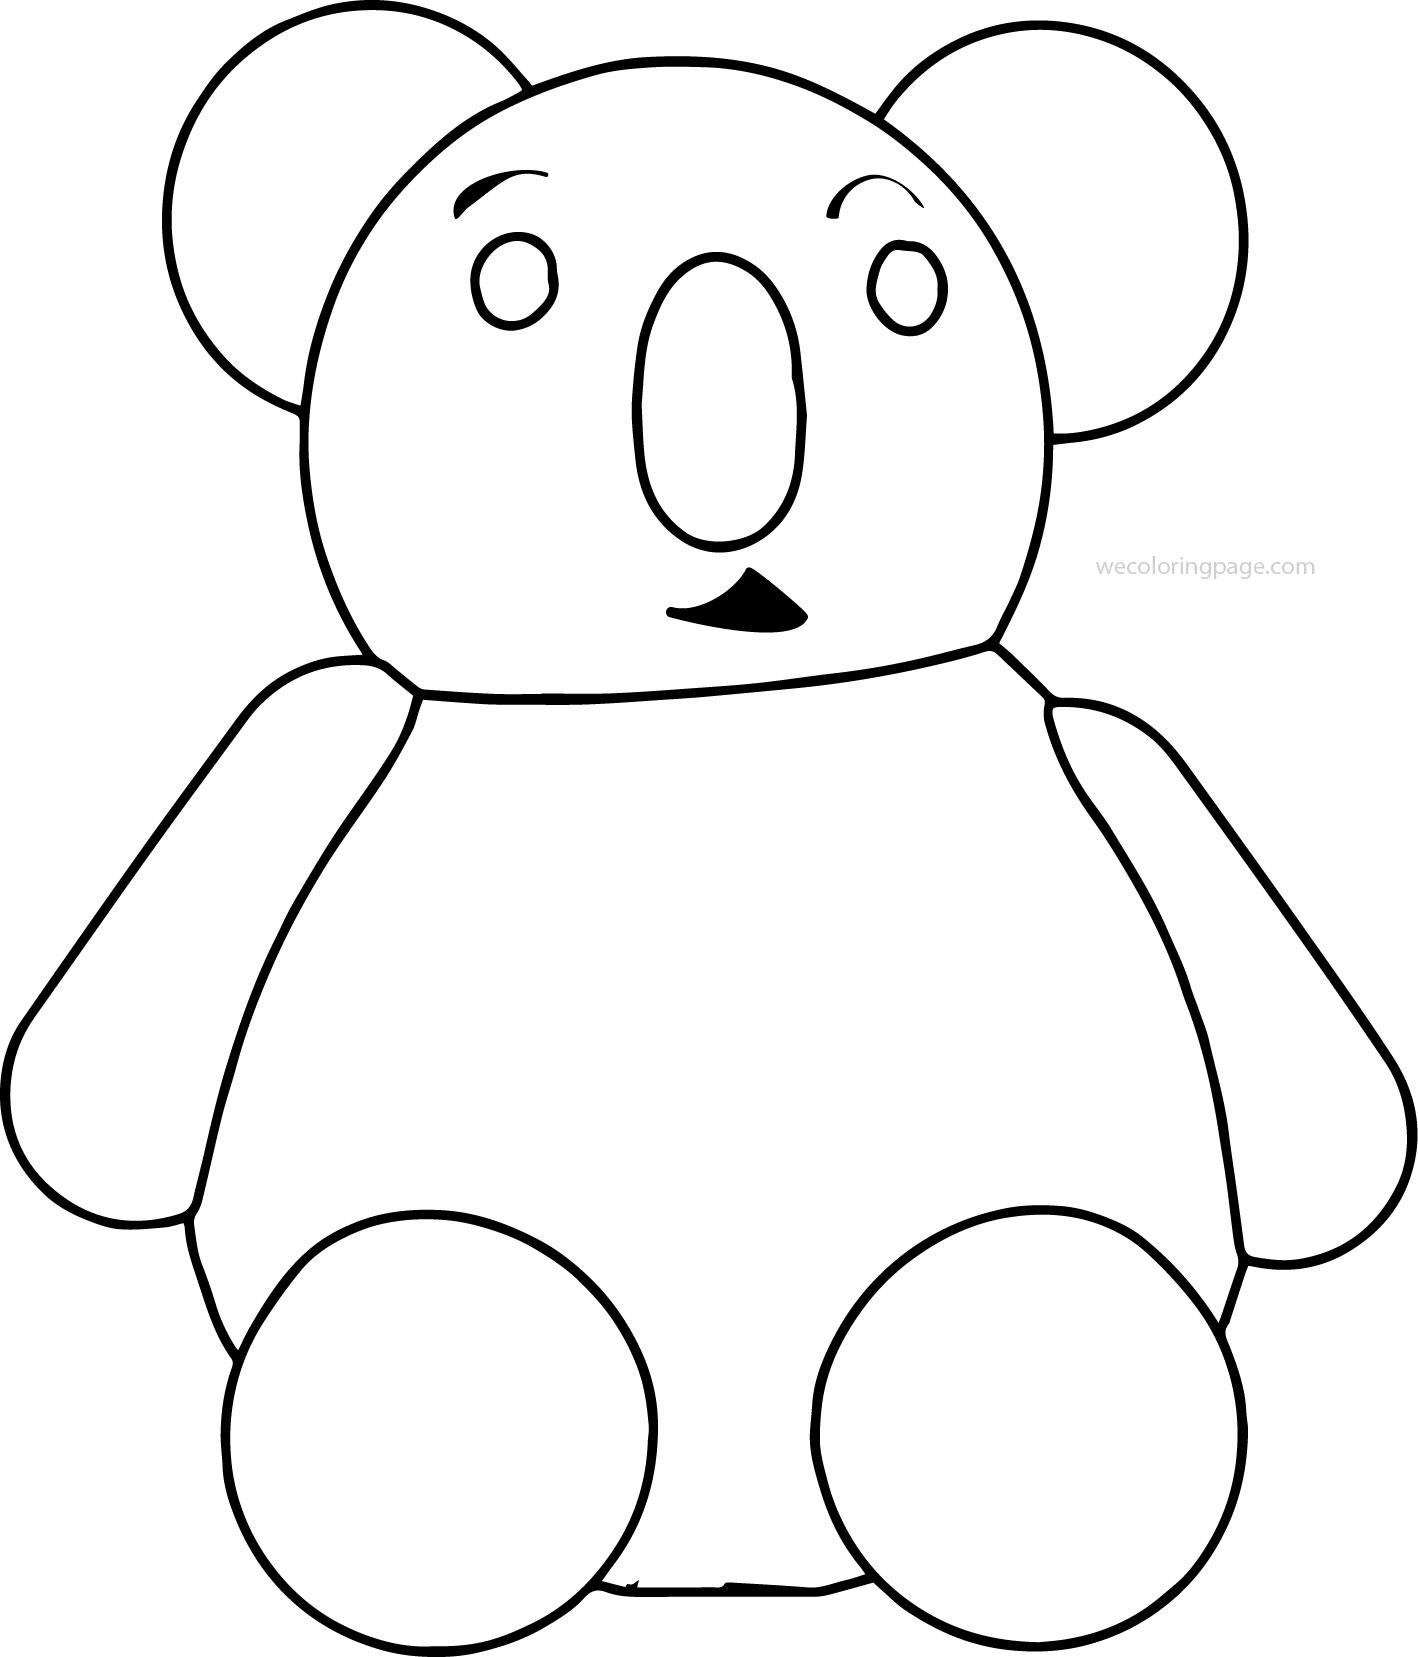 Koala Toy Coloring Page